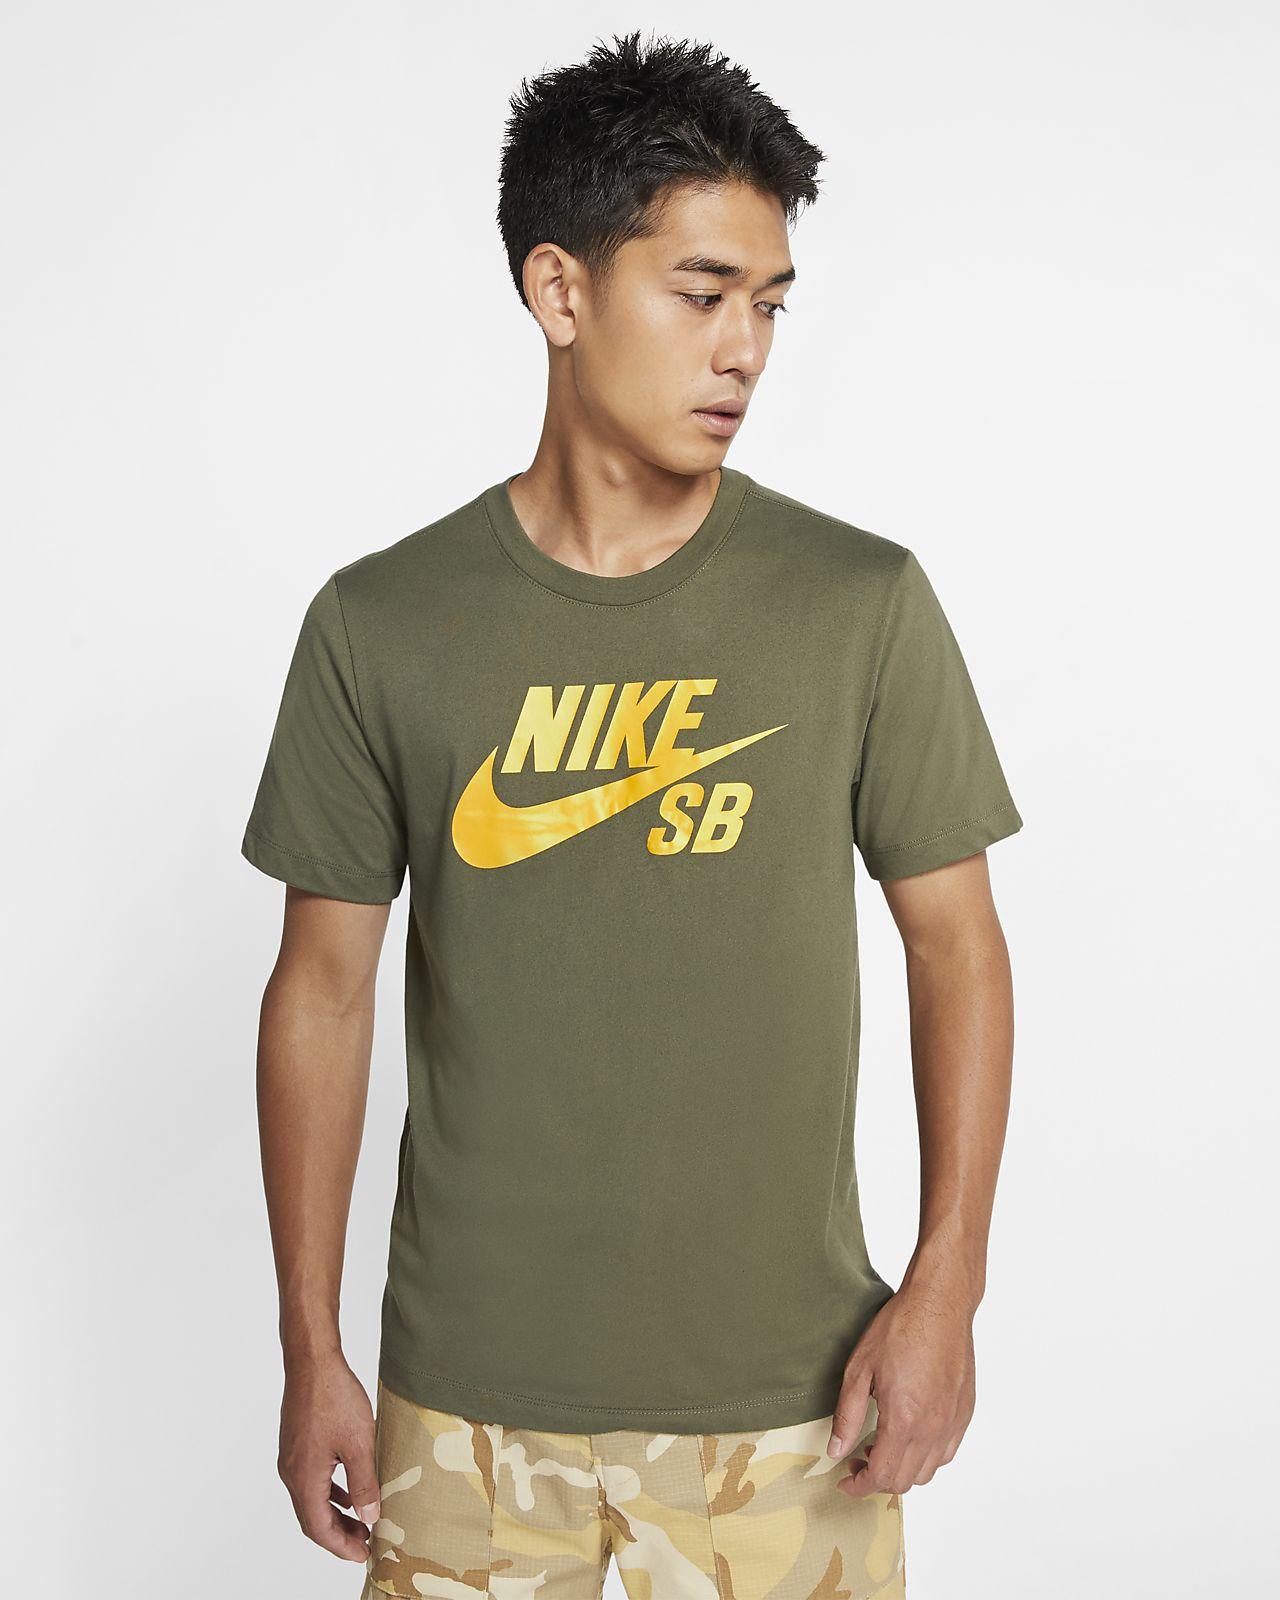 Playera de skateboarding Nike SB Dri-FIT